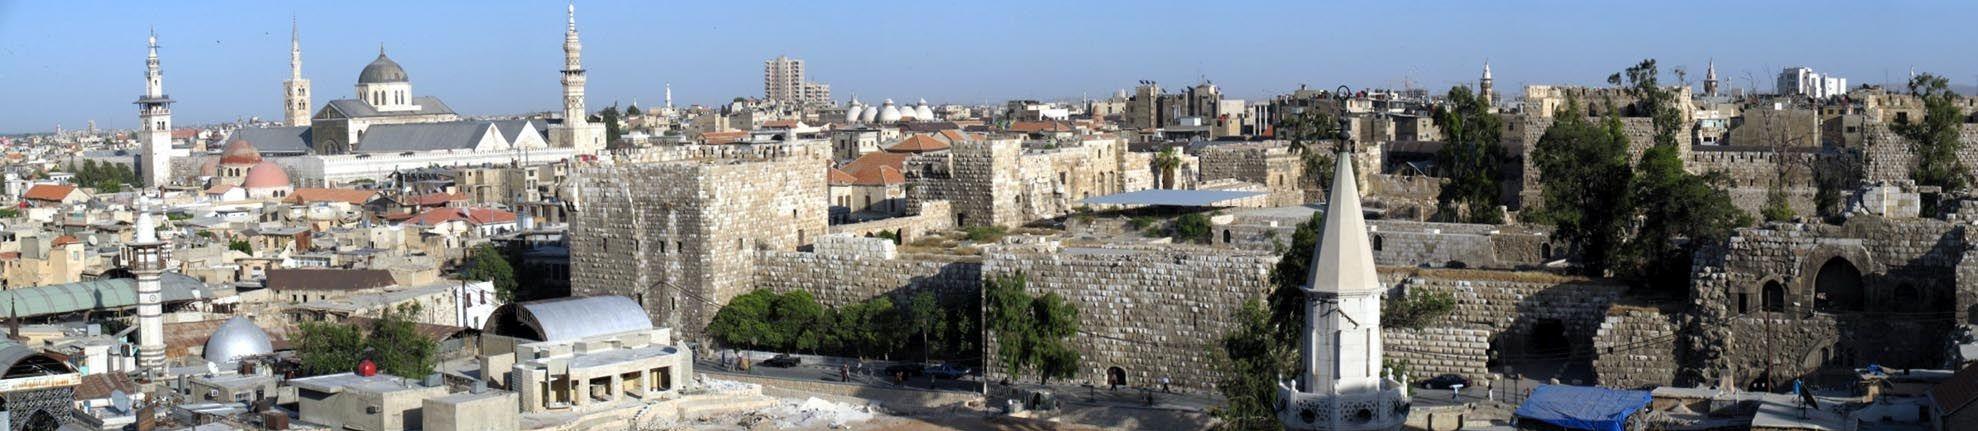 Damaskus-009